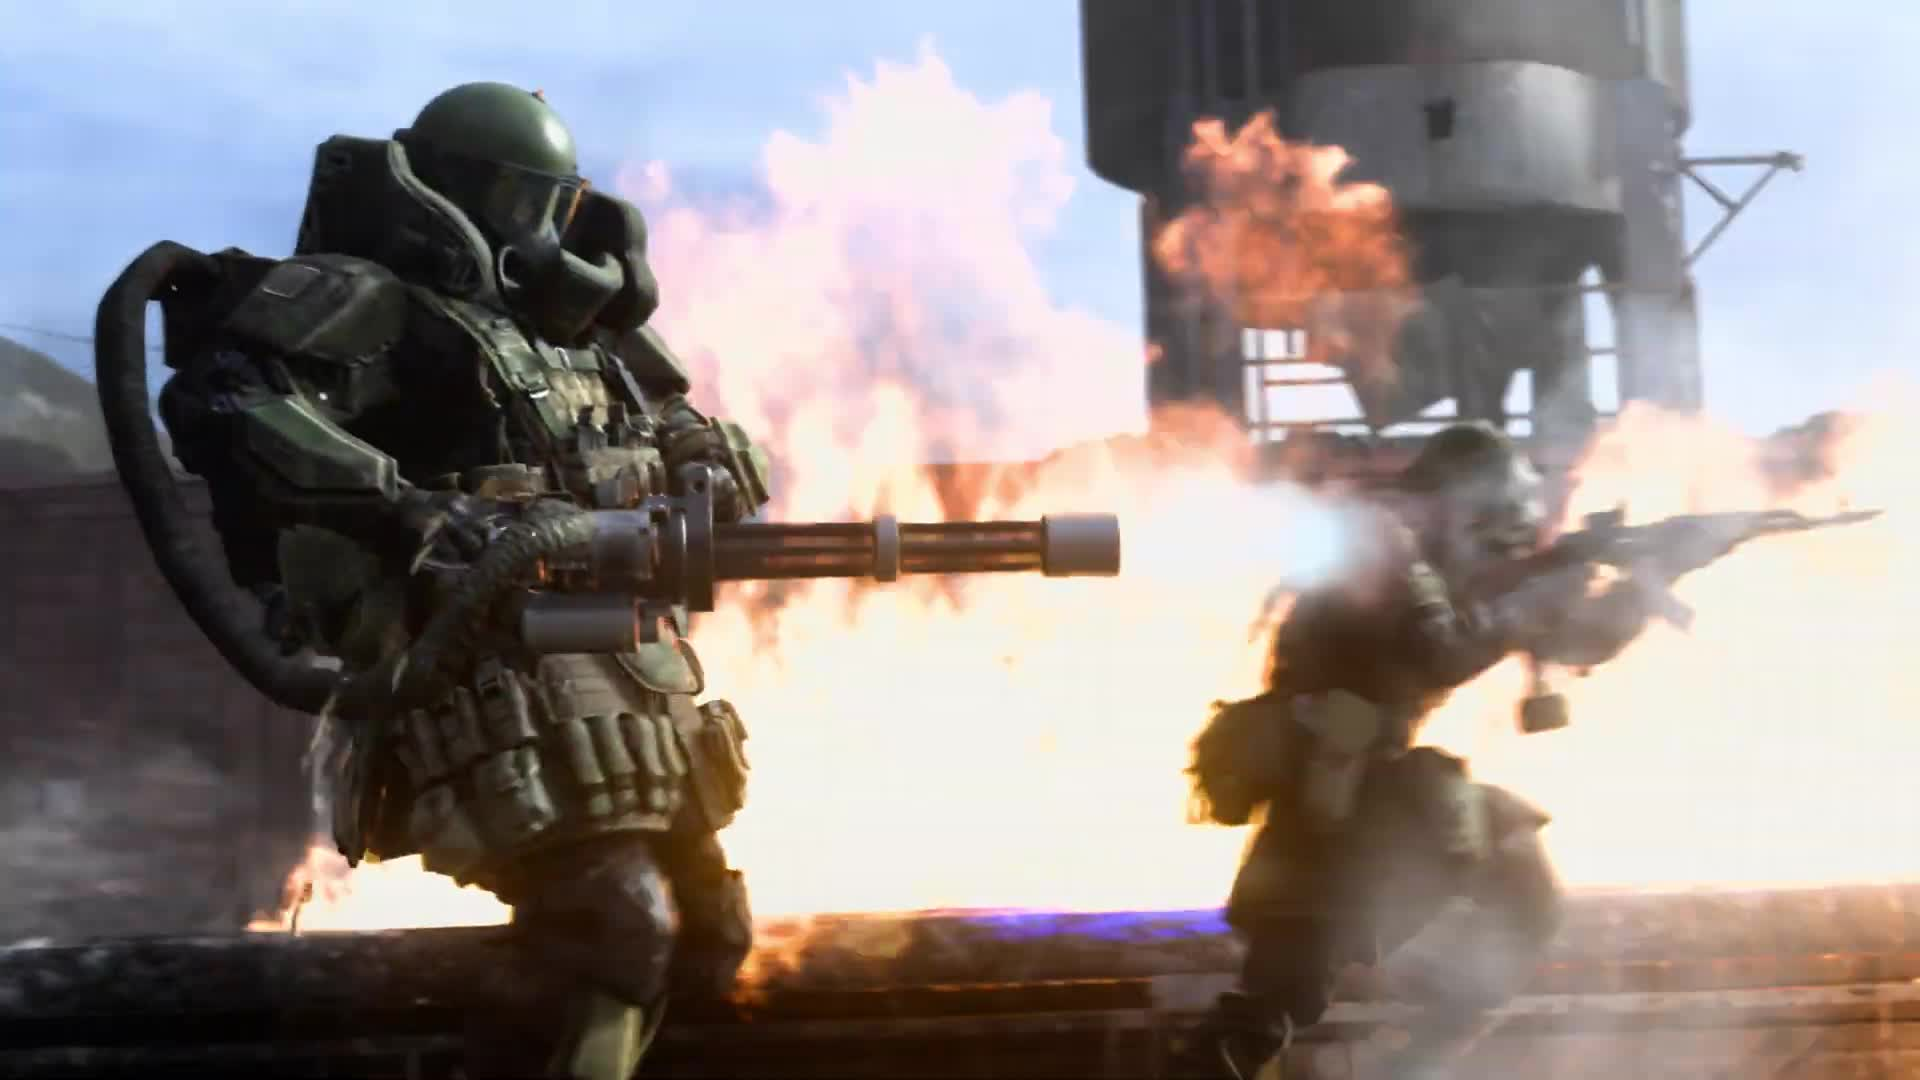 Trailer, Ego-Shooter, Multiplayer, Call of Duty, Activision, Modern Warfare, Infinity Ward, Call of Duty: Modern Warfare